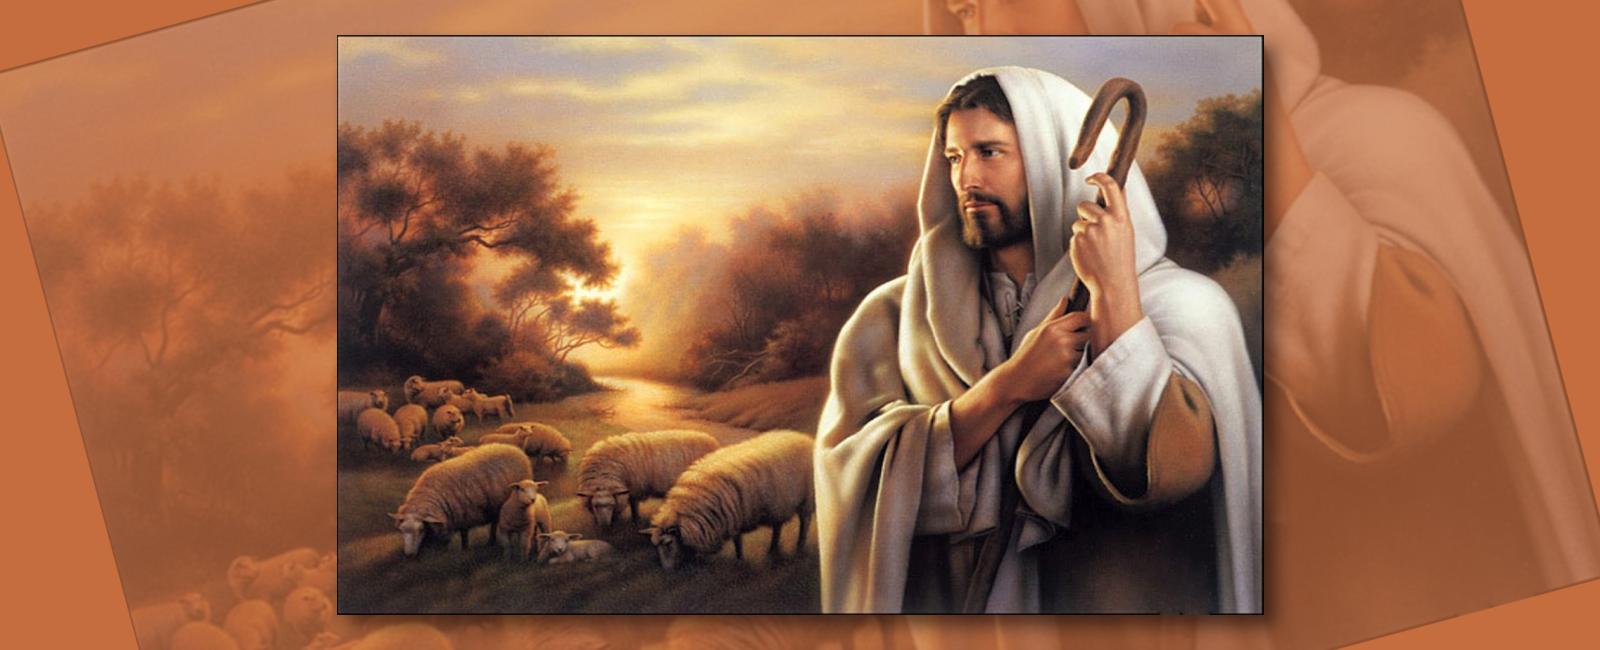 Parroquia El Altet - Evangelio Domingo 12 de Mayo 2019